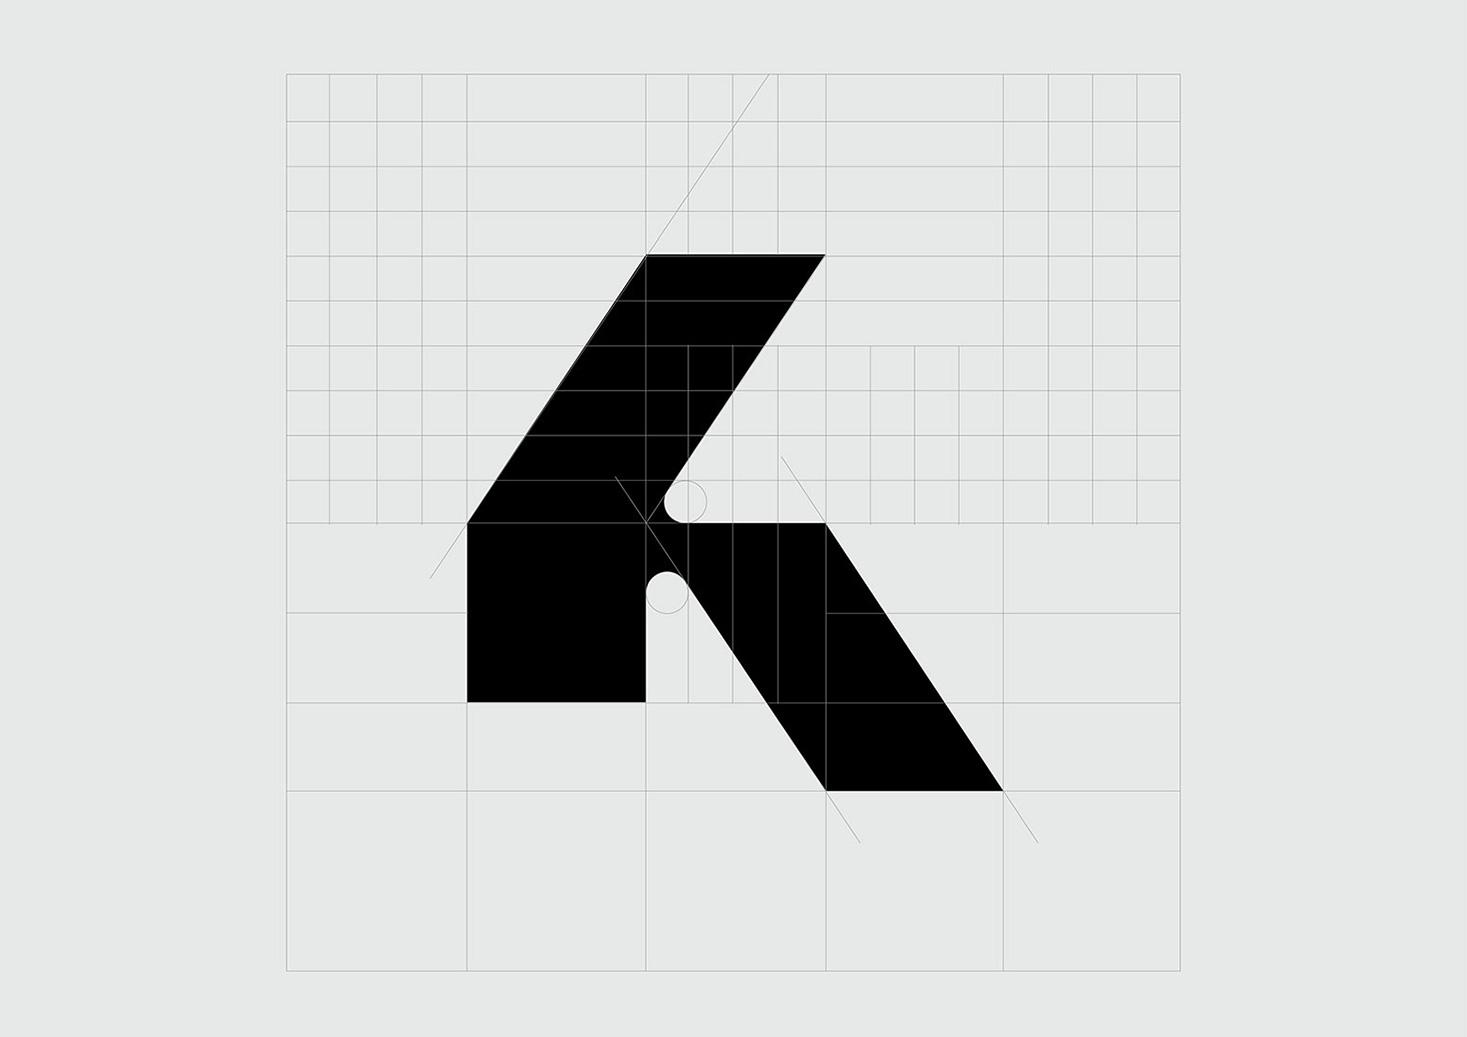 klasta_costruzione_xslider